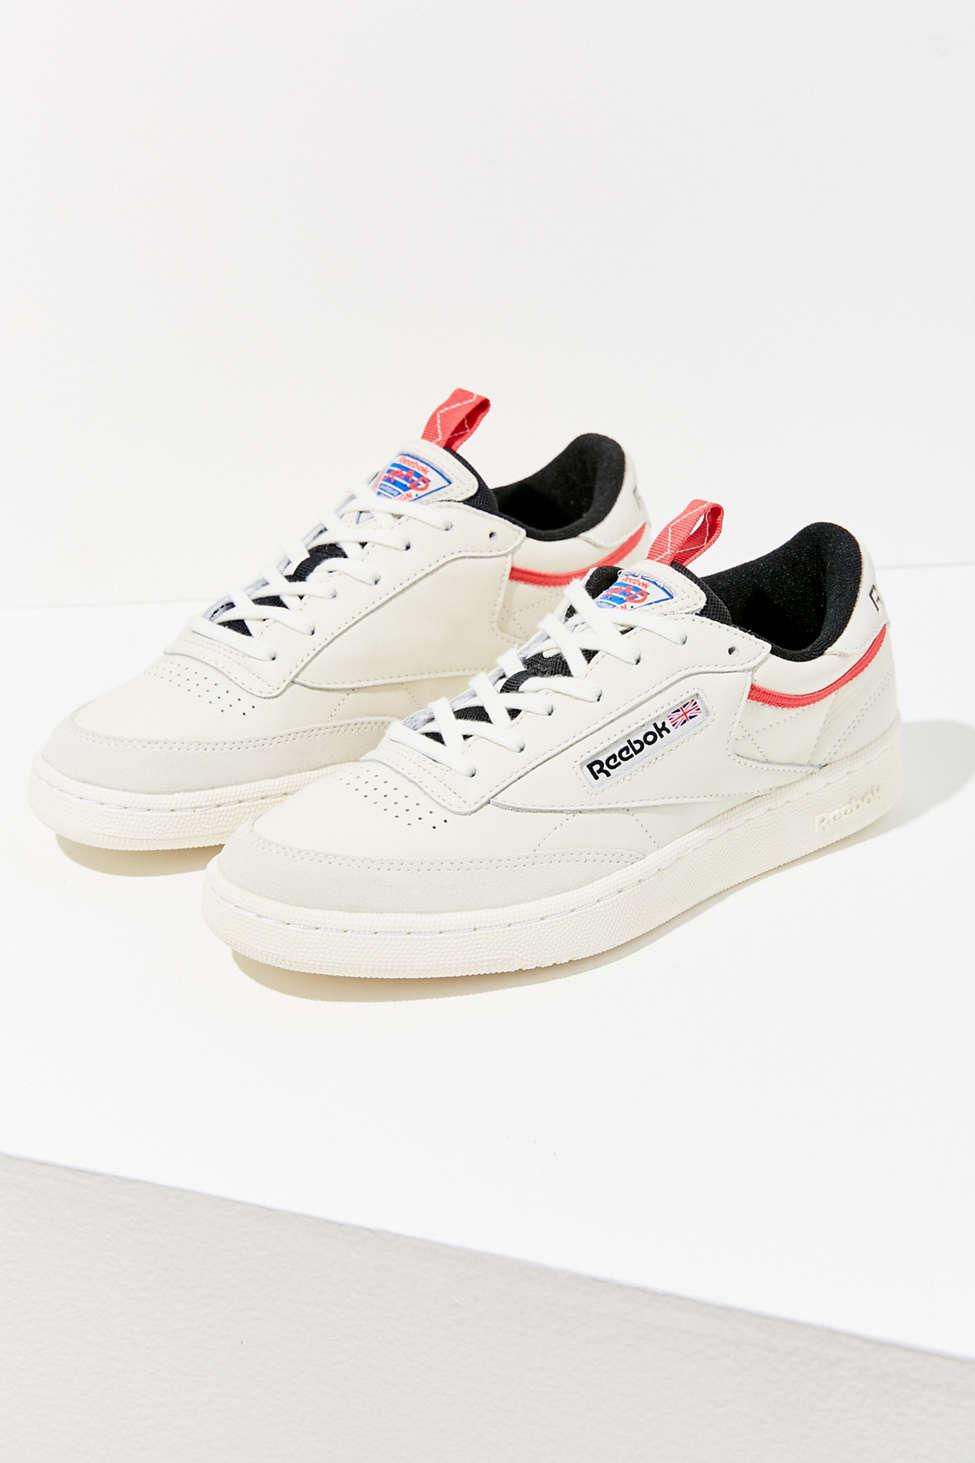 Reebok Club C 85 RAD Sneaker